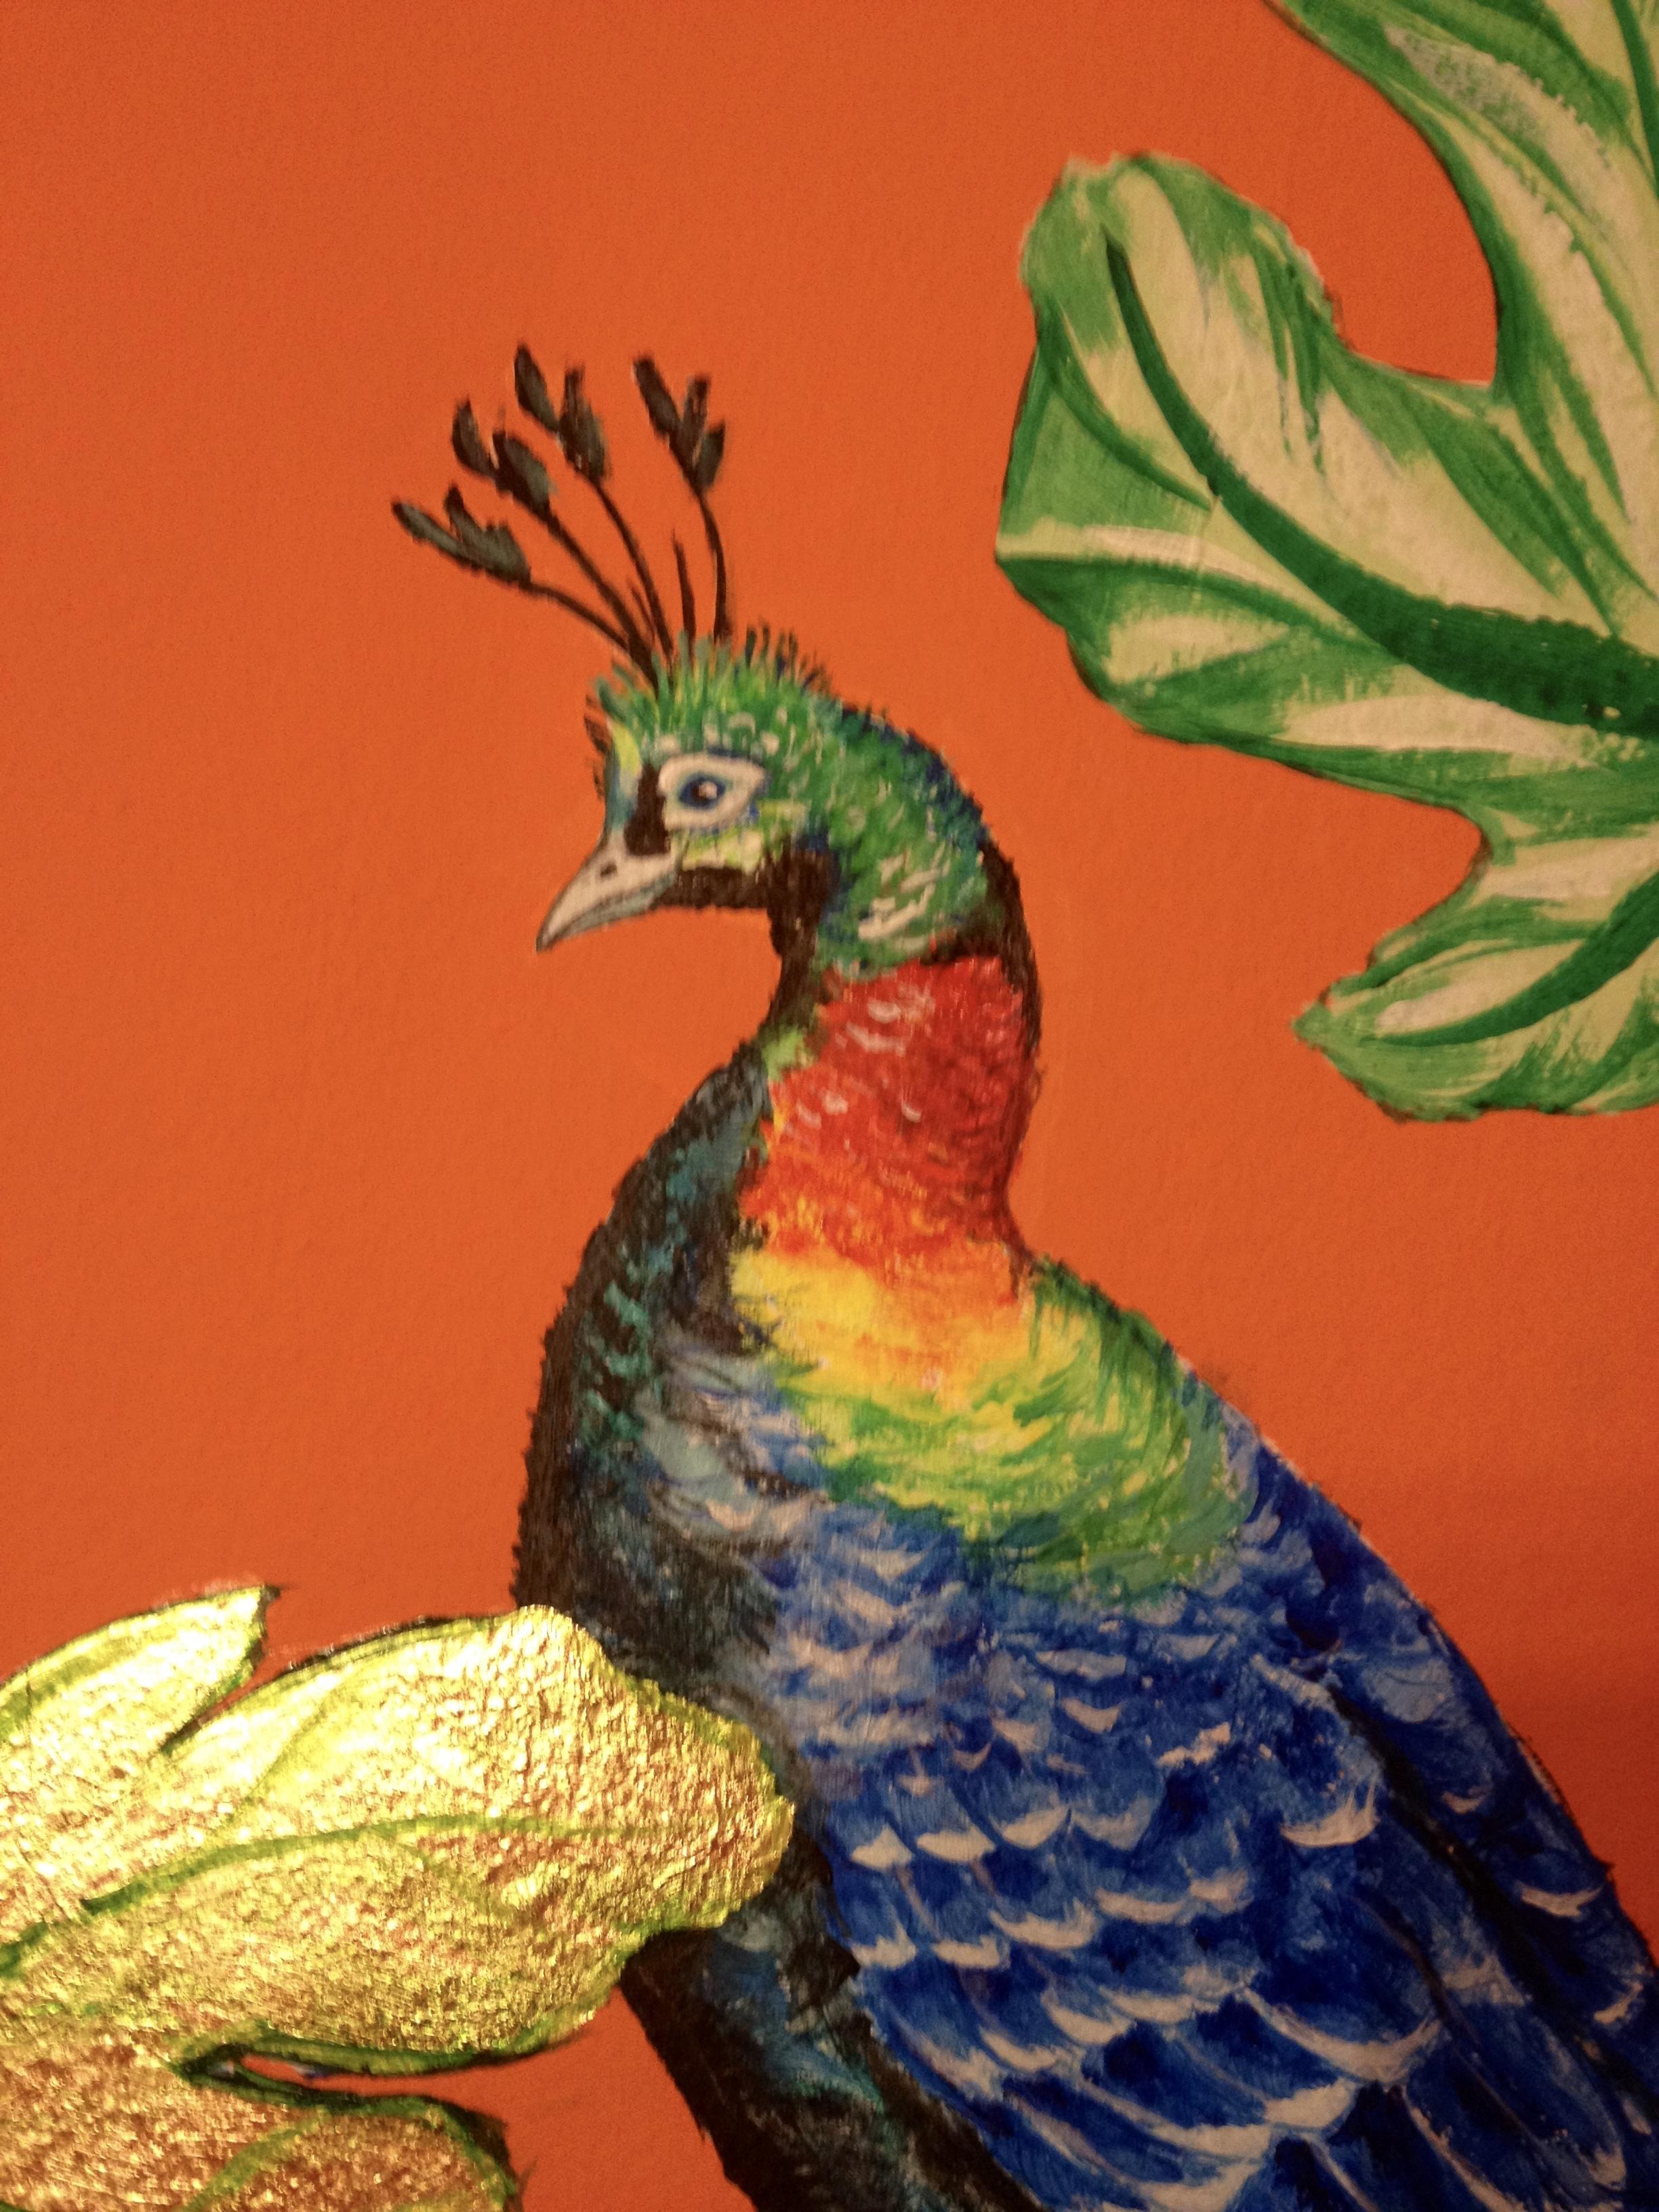 cozmo orange stairwell - gold leaf detail - Frederick Wimsett - murals and artistic design - WALLS .jpg